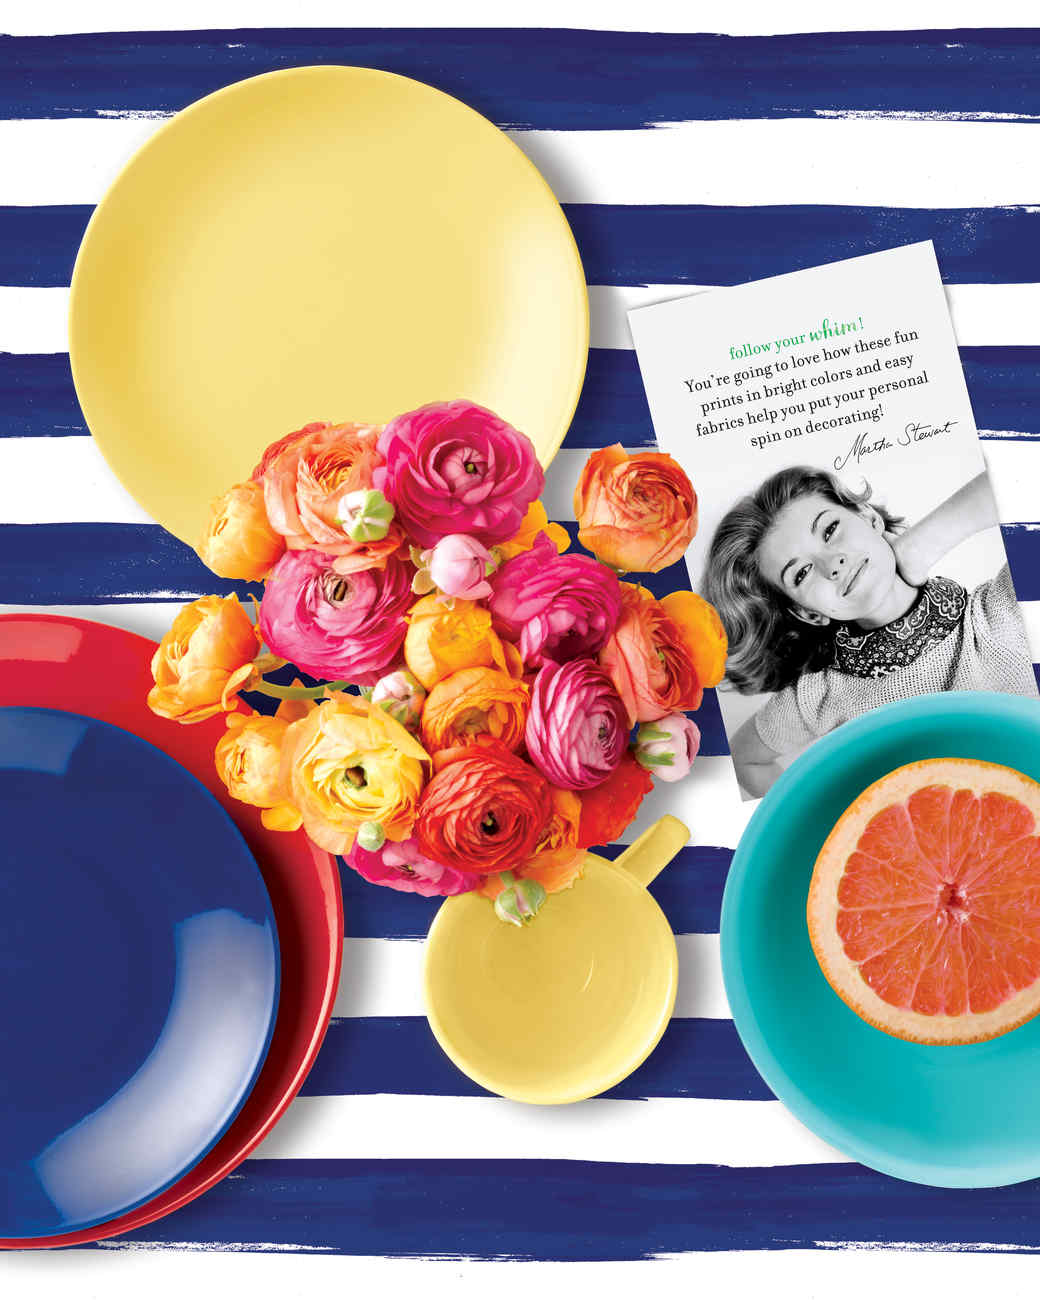 msmacys-whim-dinnerware-heroimage-mrkt-0115.jpg